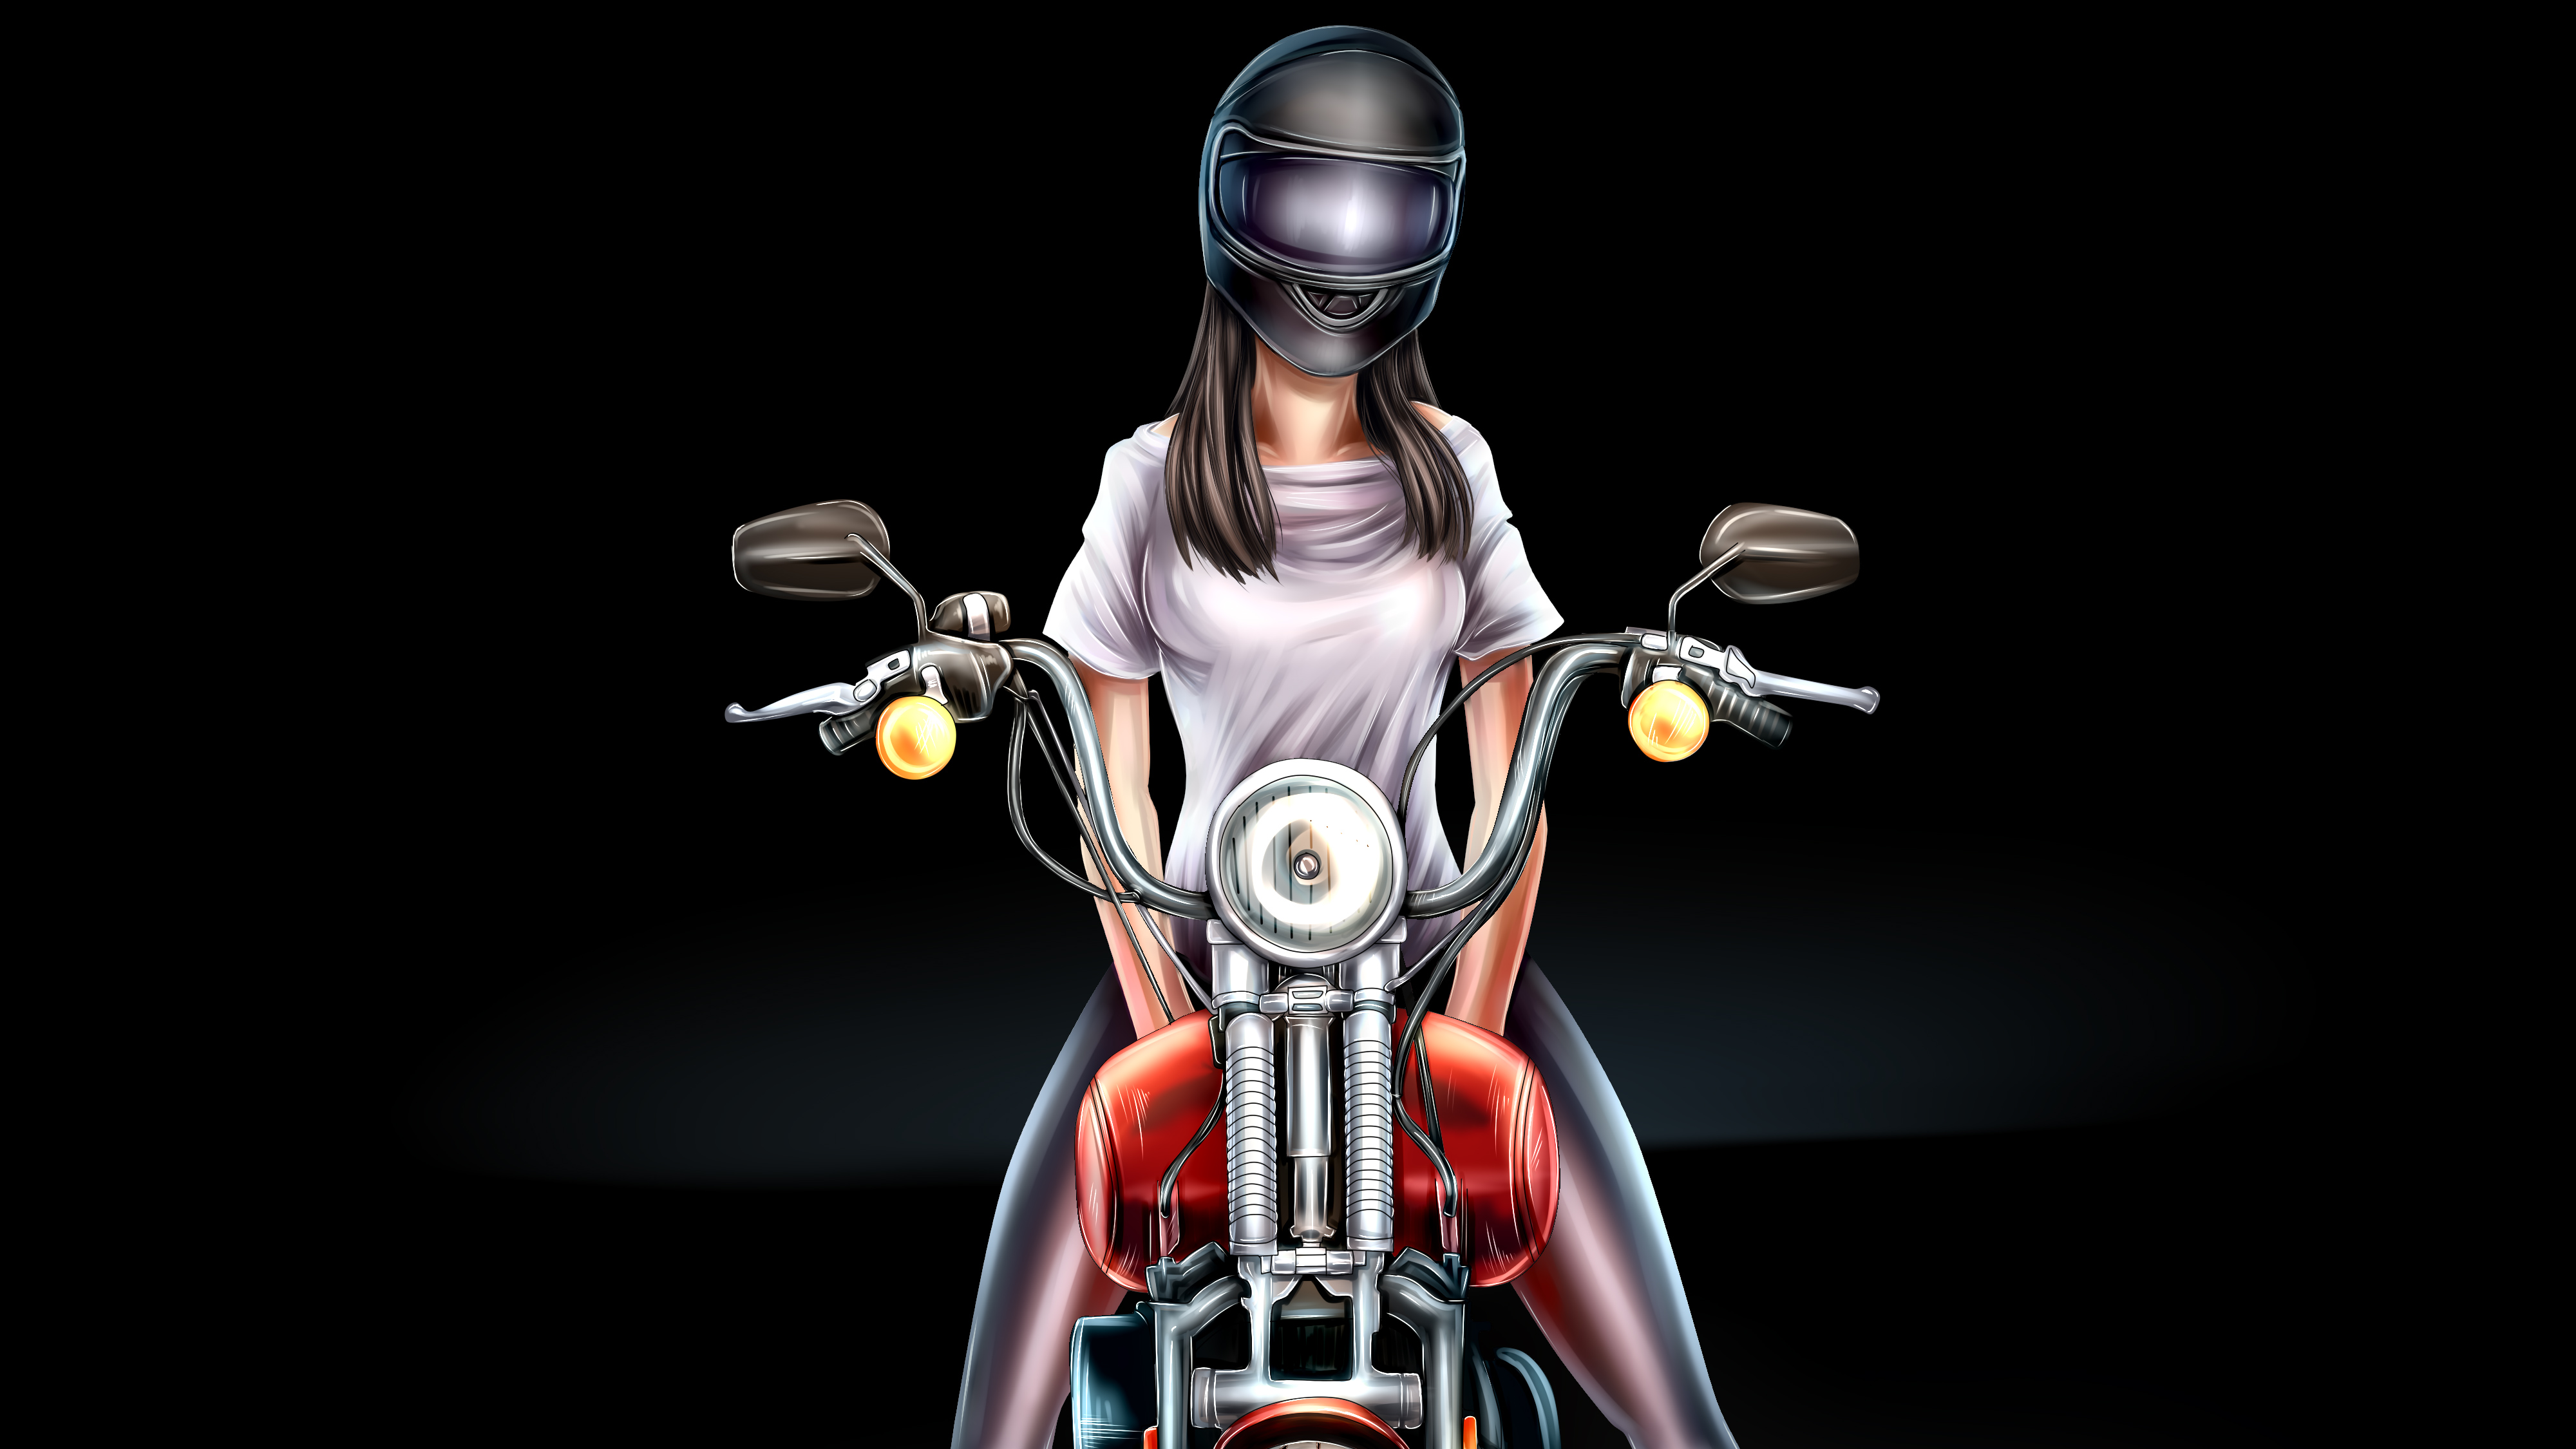 Biker Girl Digital Art 4k Hd Artist 4k Wallpapers Images Backgrounds Photos And Pictures